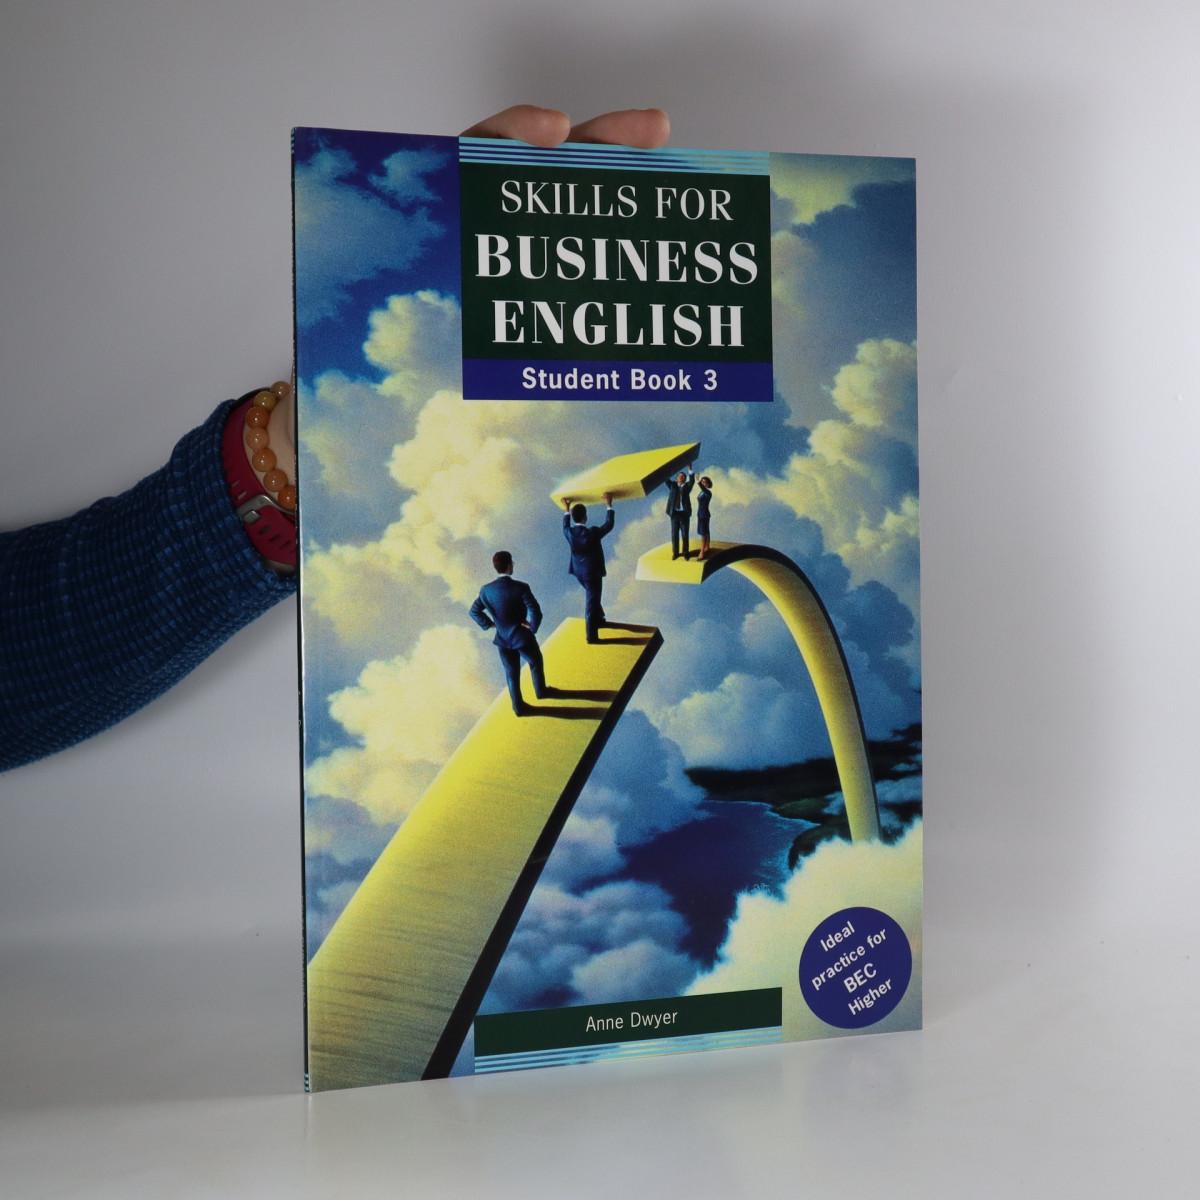 antikvární kniha Skills for business English. Student book 3, neuveden